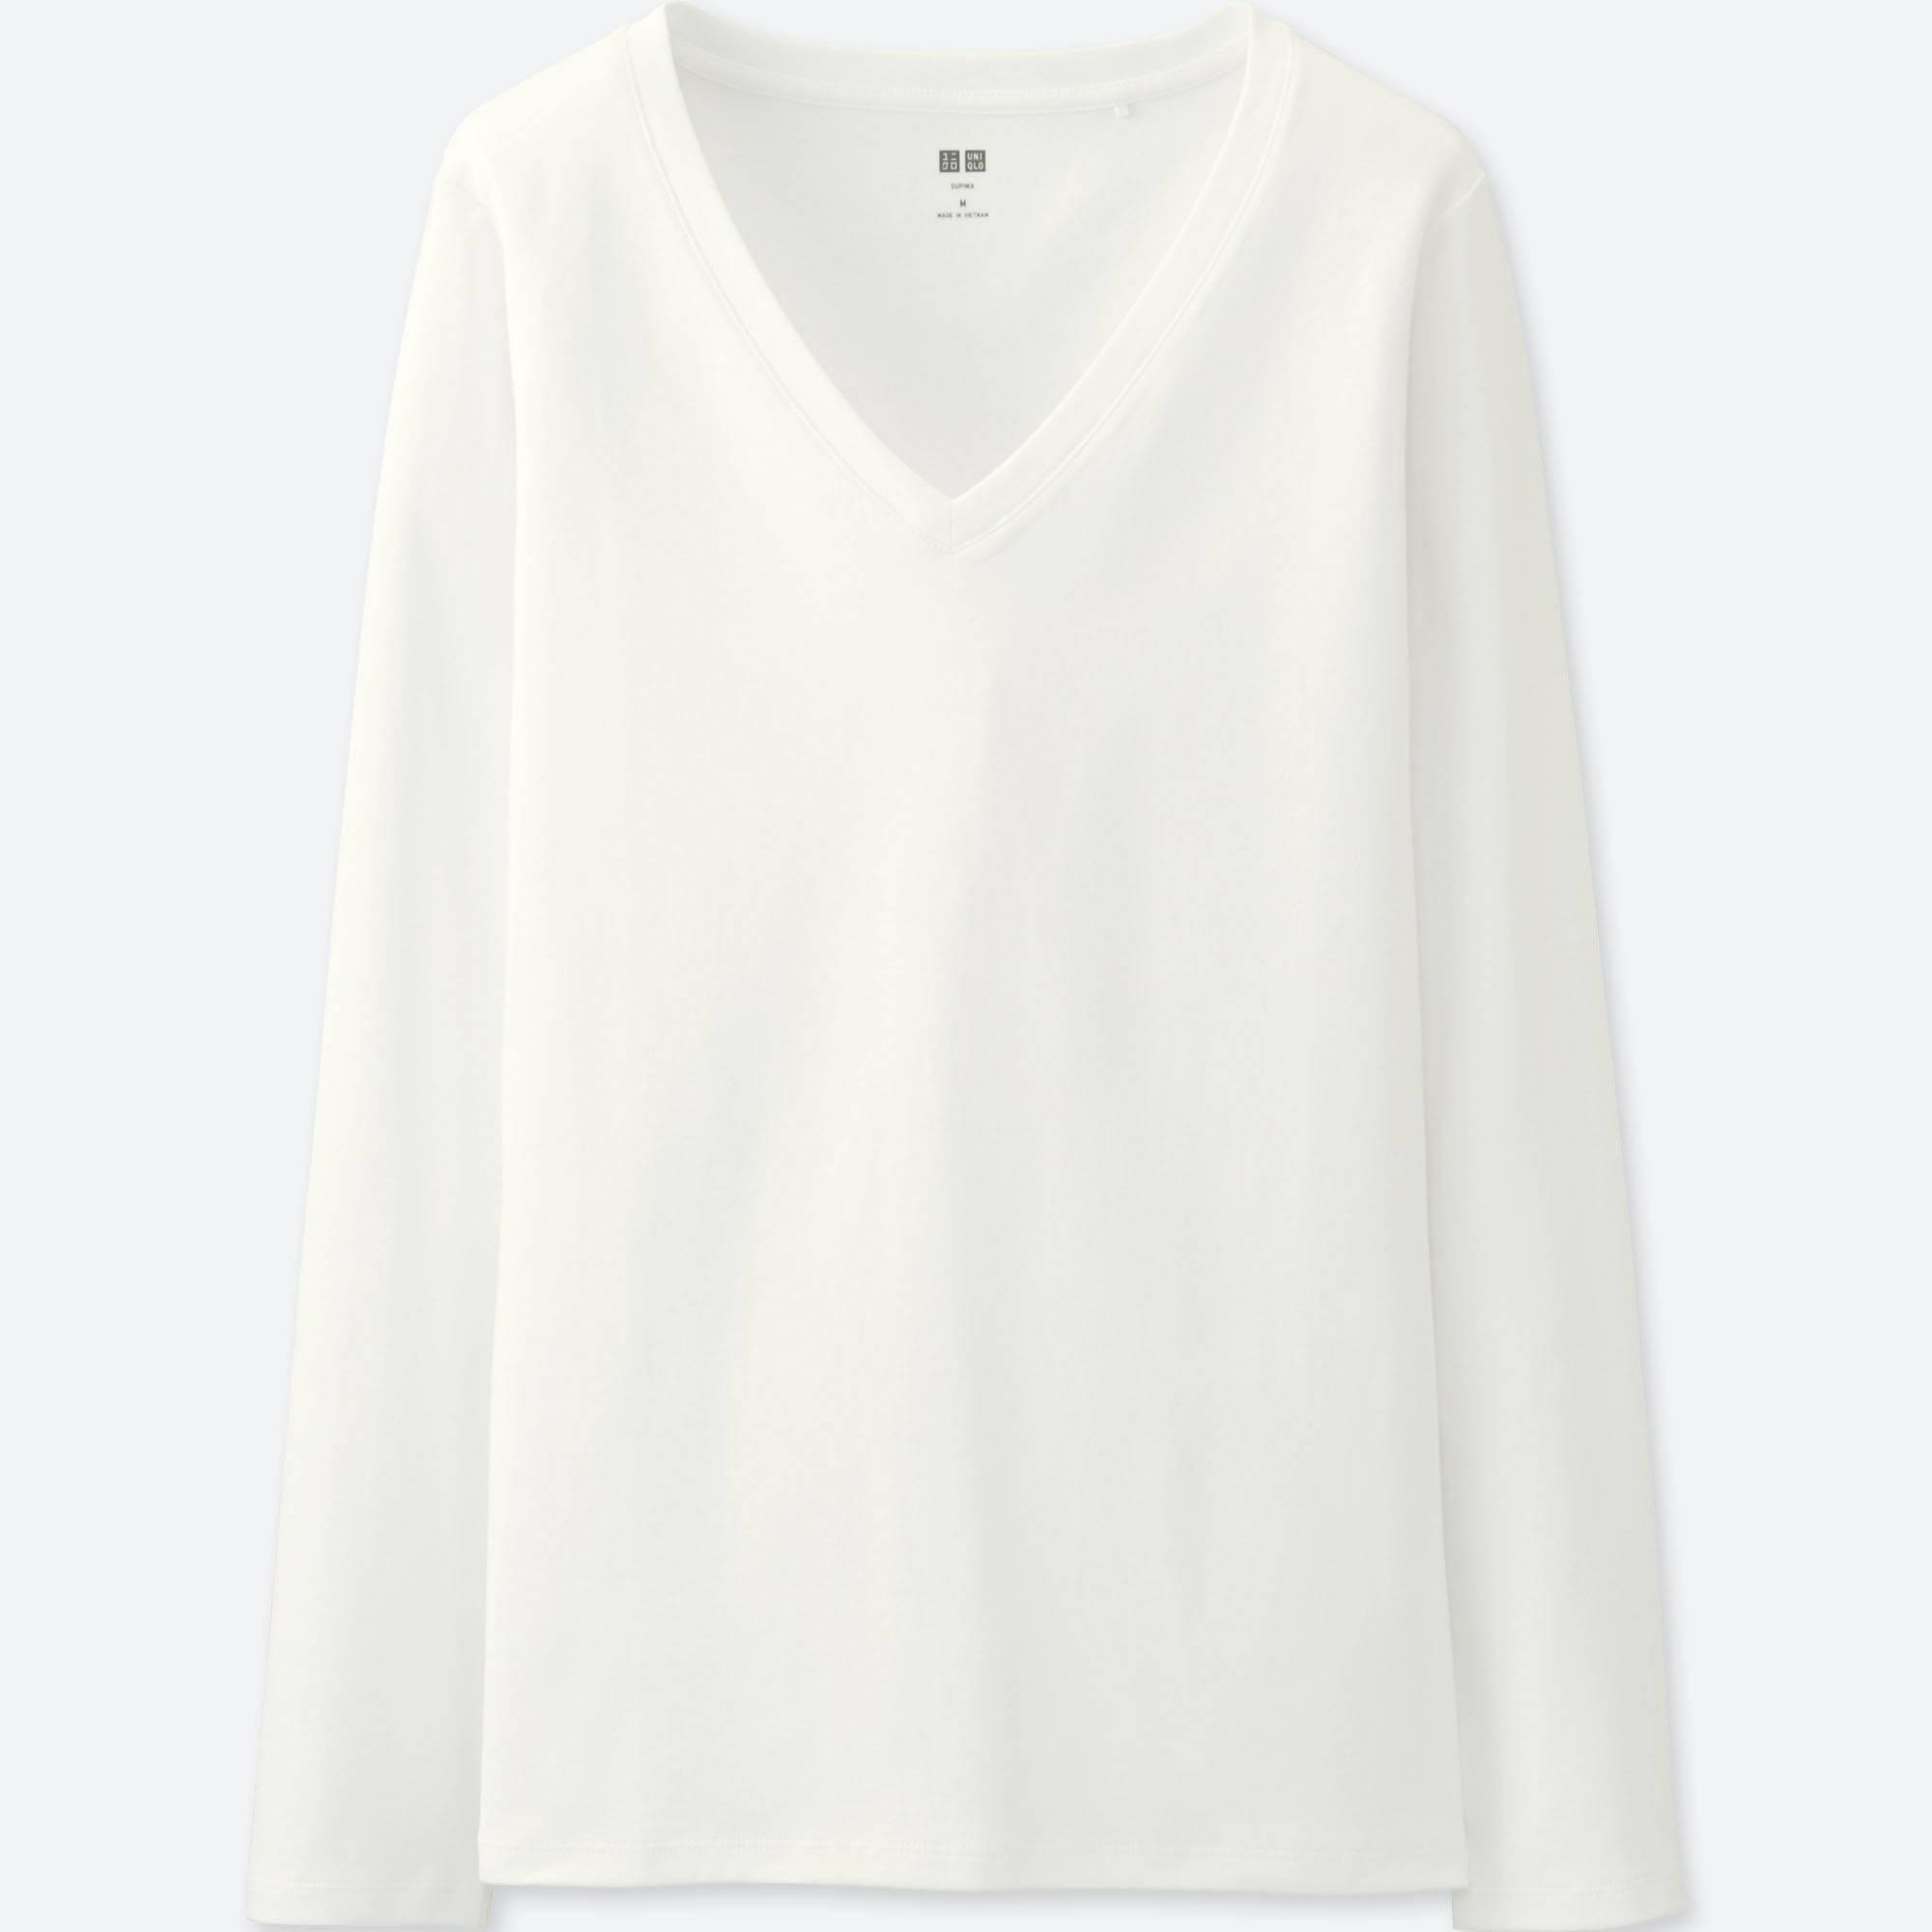 cb3cc6323c6f1 Womens Pima Cotton Long Sleeve T Shirts